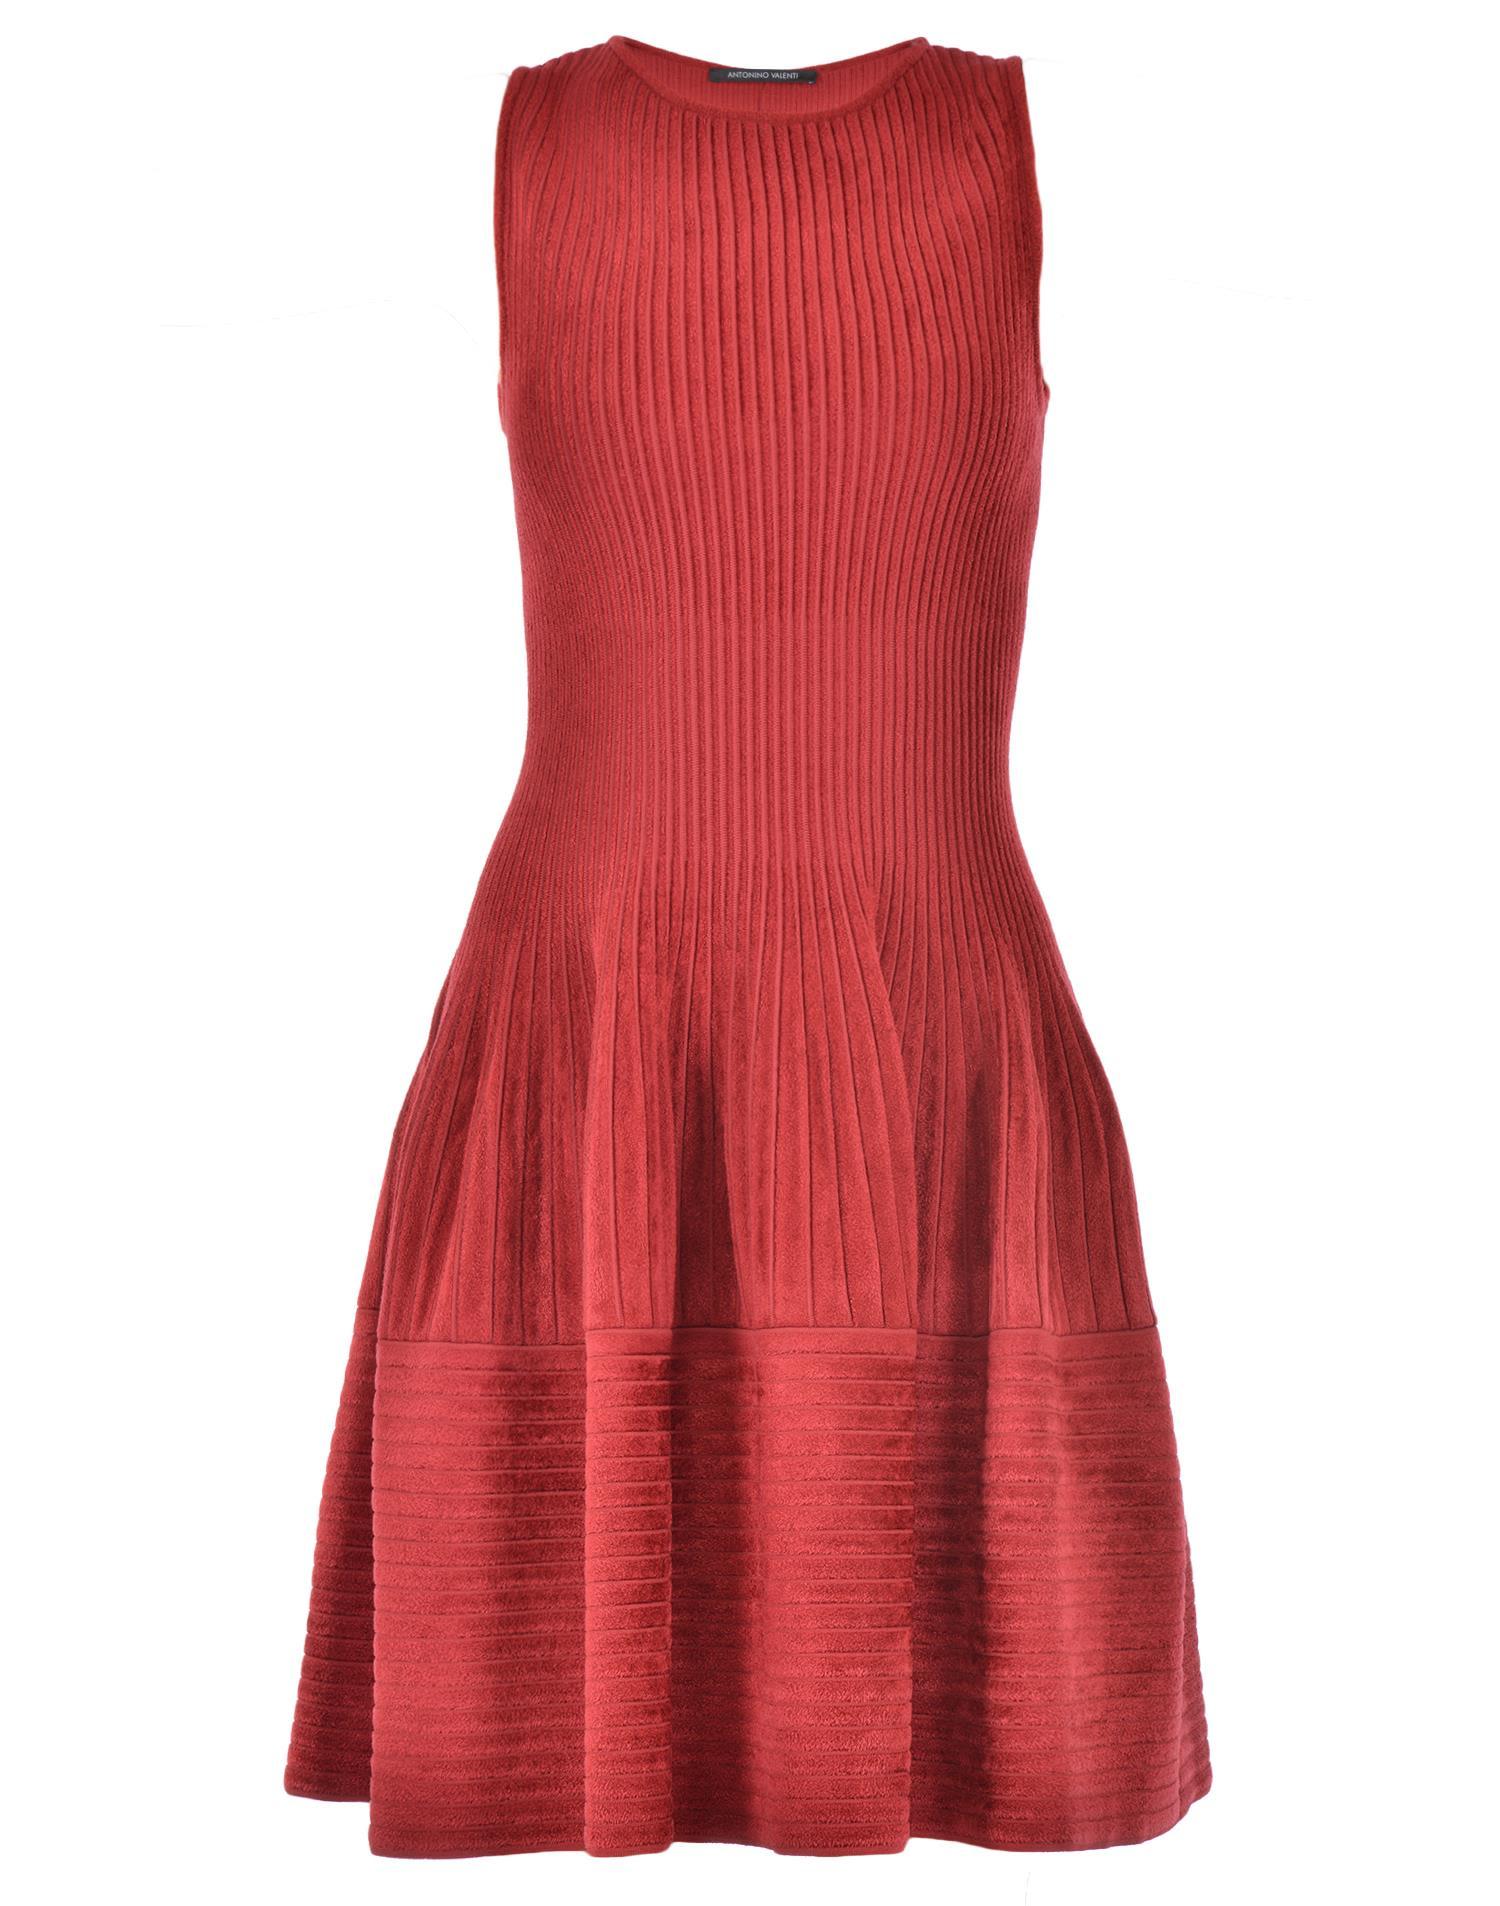 Antonino Valenti Ribbed Dress